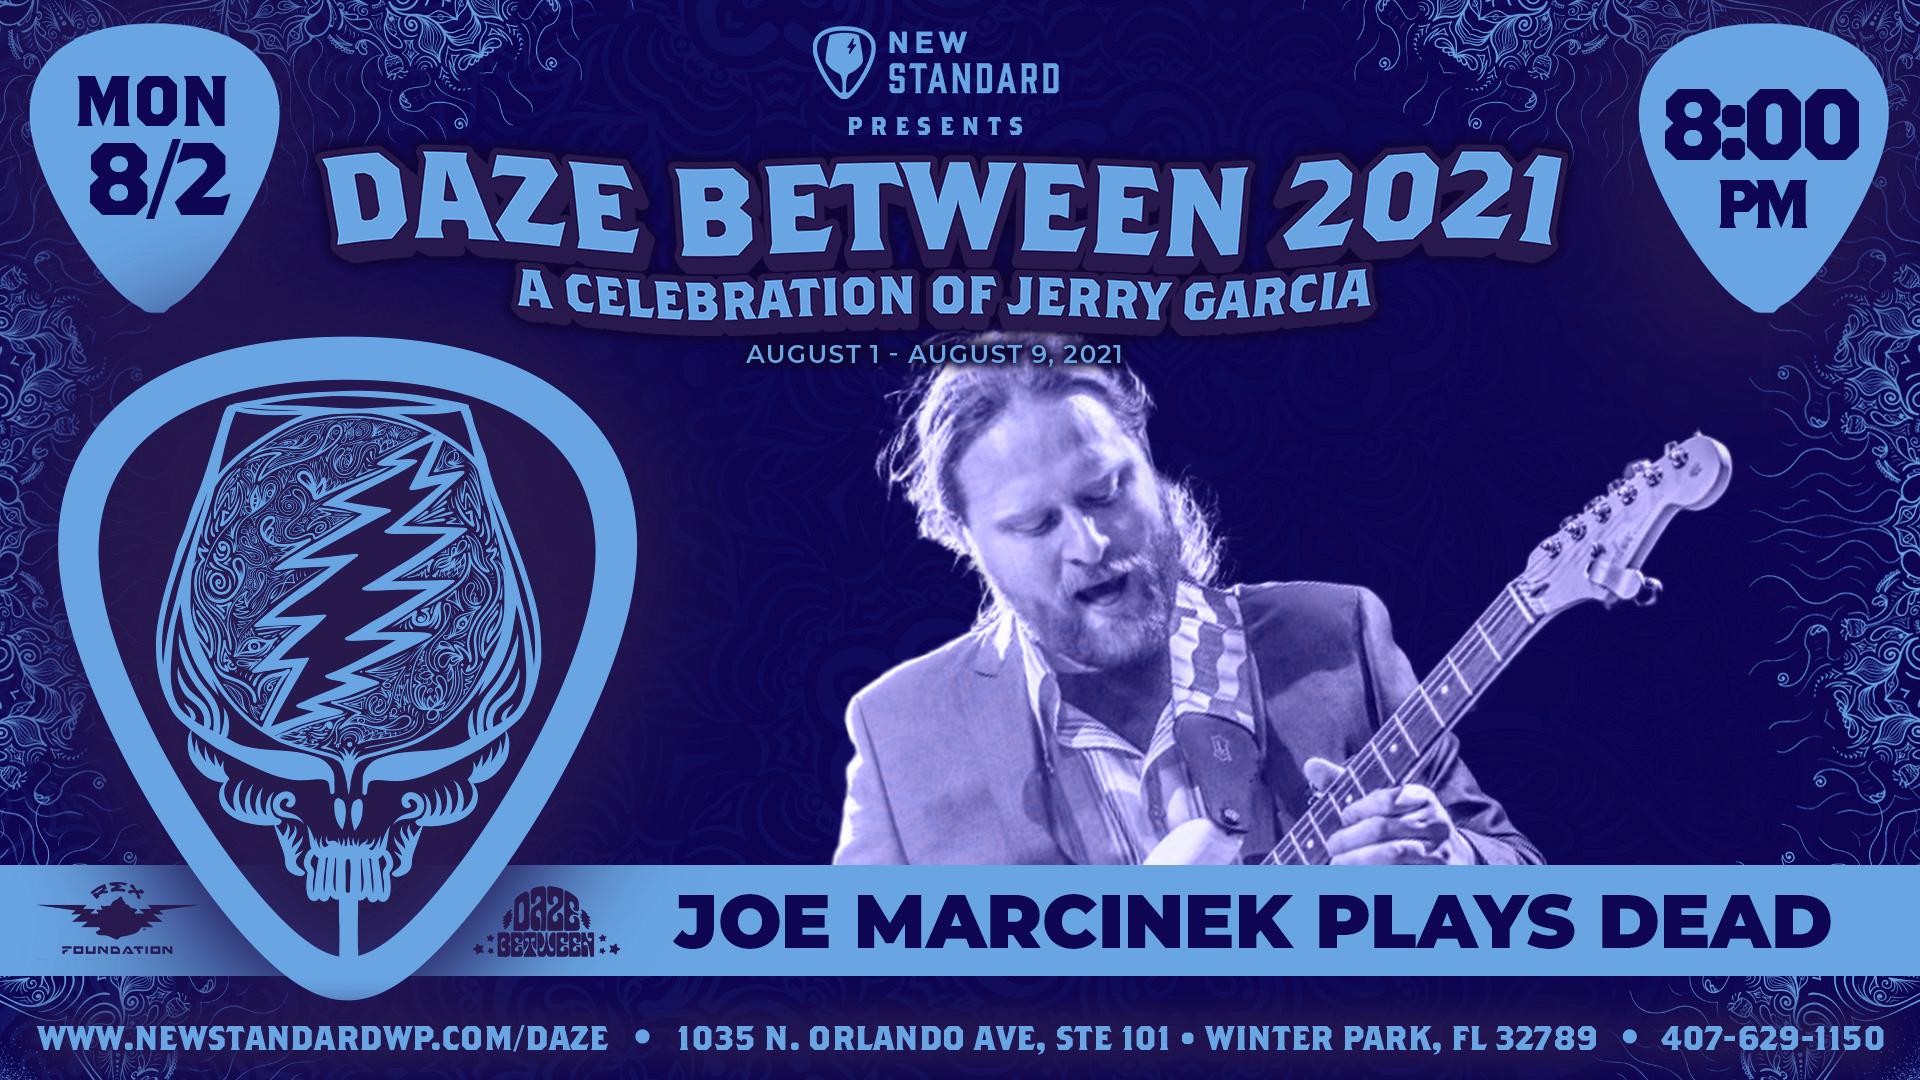 Photo for Joe Marcinek Plays Dead - Live at The New Standard - Daze Between 2021 on ViewStub